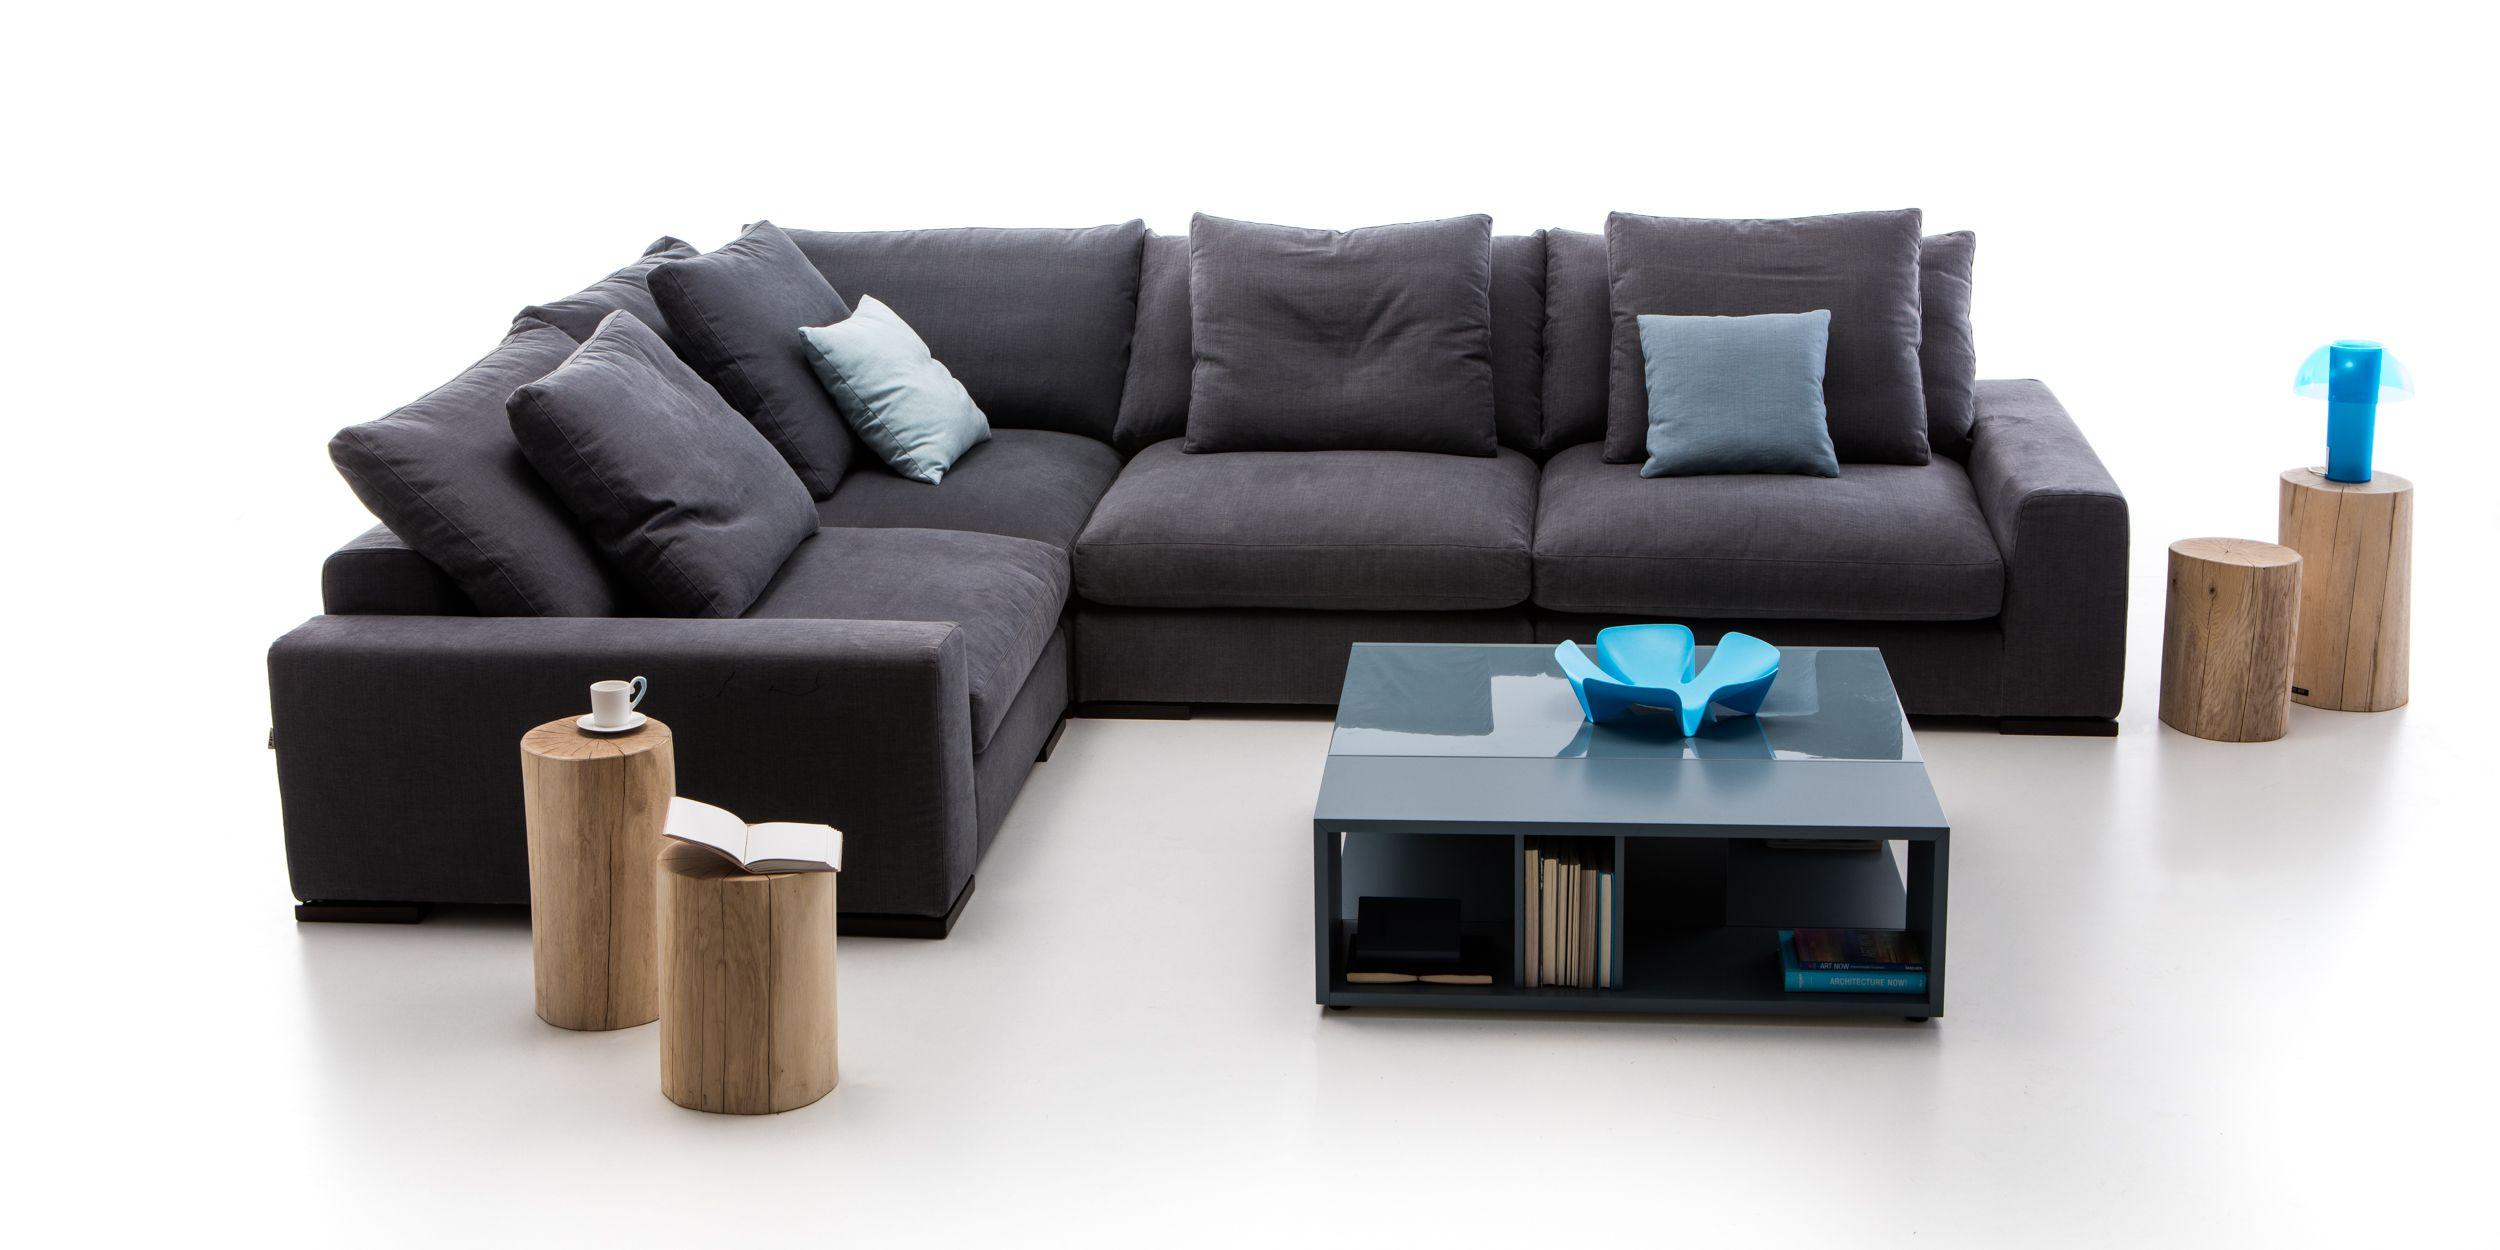 olta new york sofa bed new york hmmi